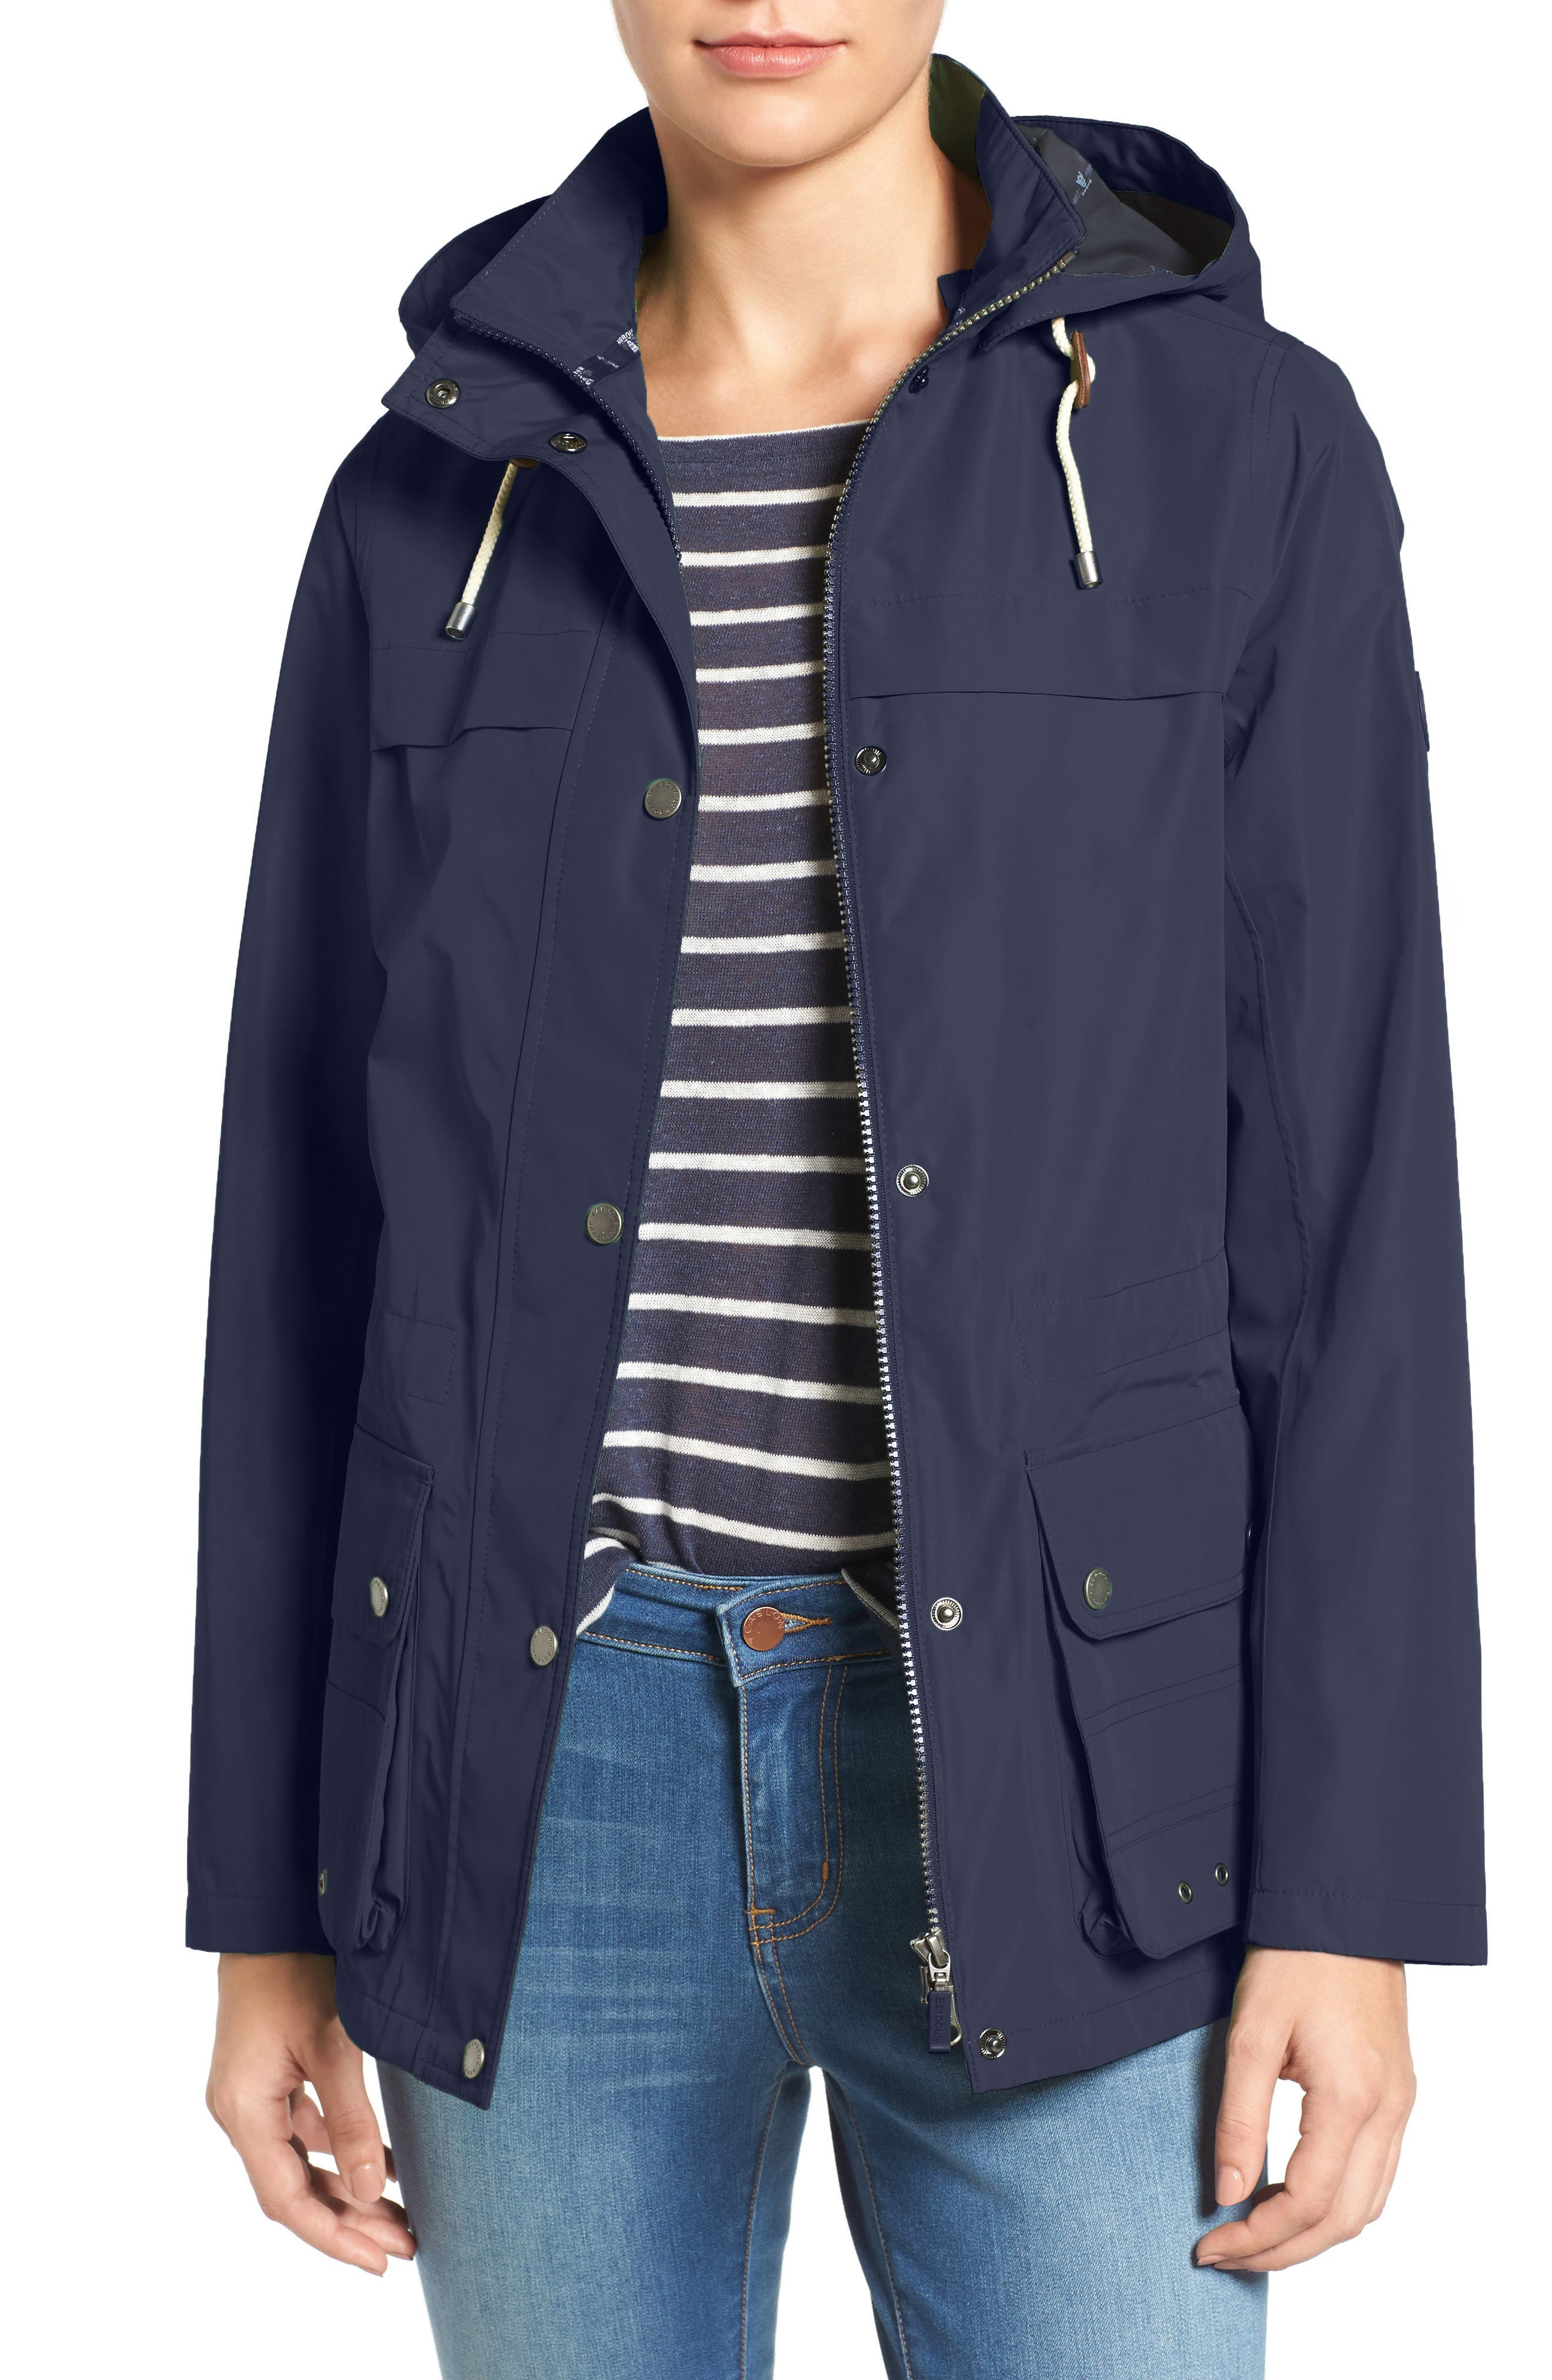 Lowmoore Raincoat,                         Main,                         color, Dark Navy